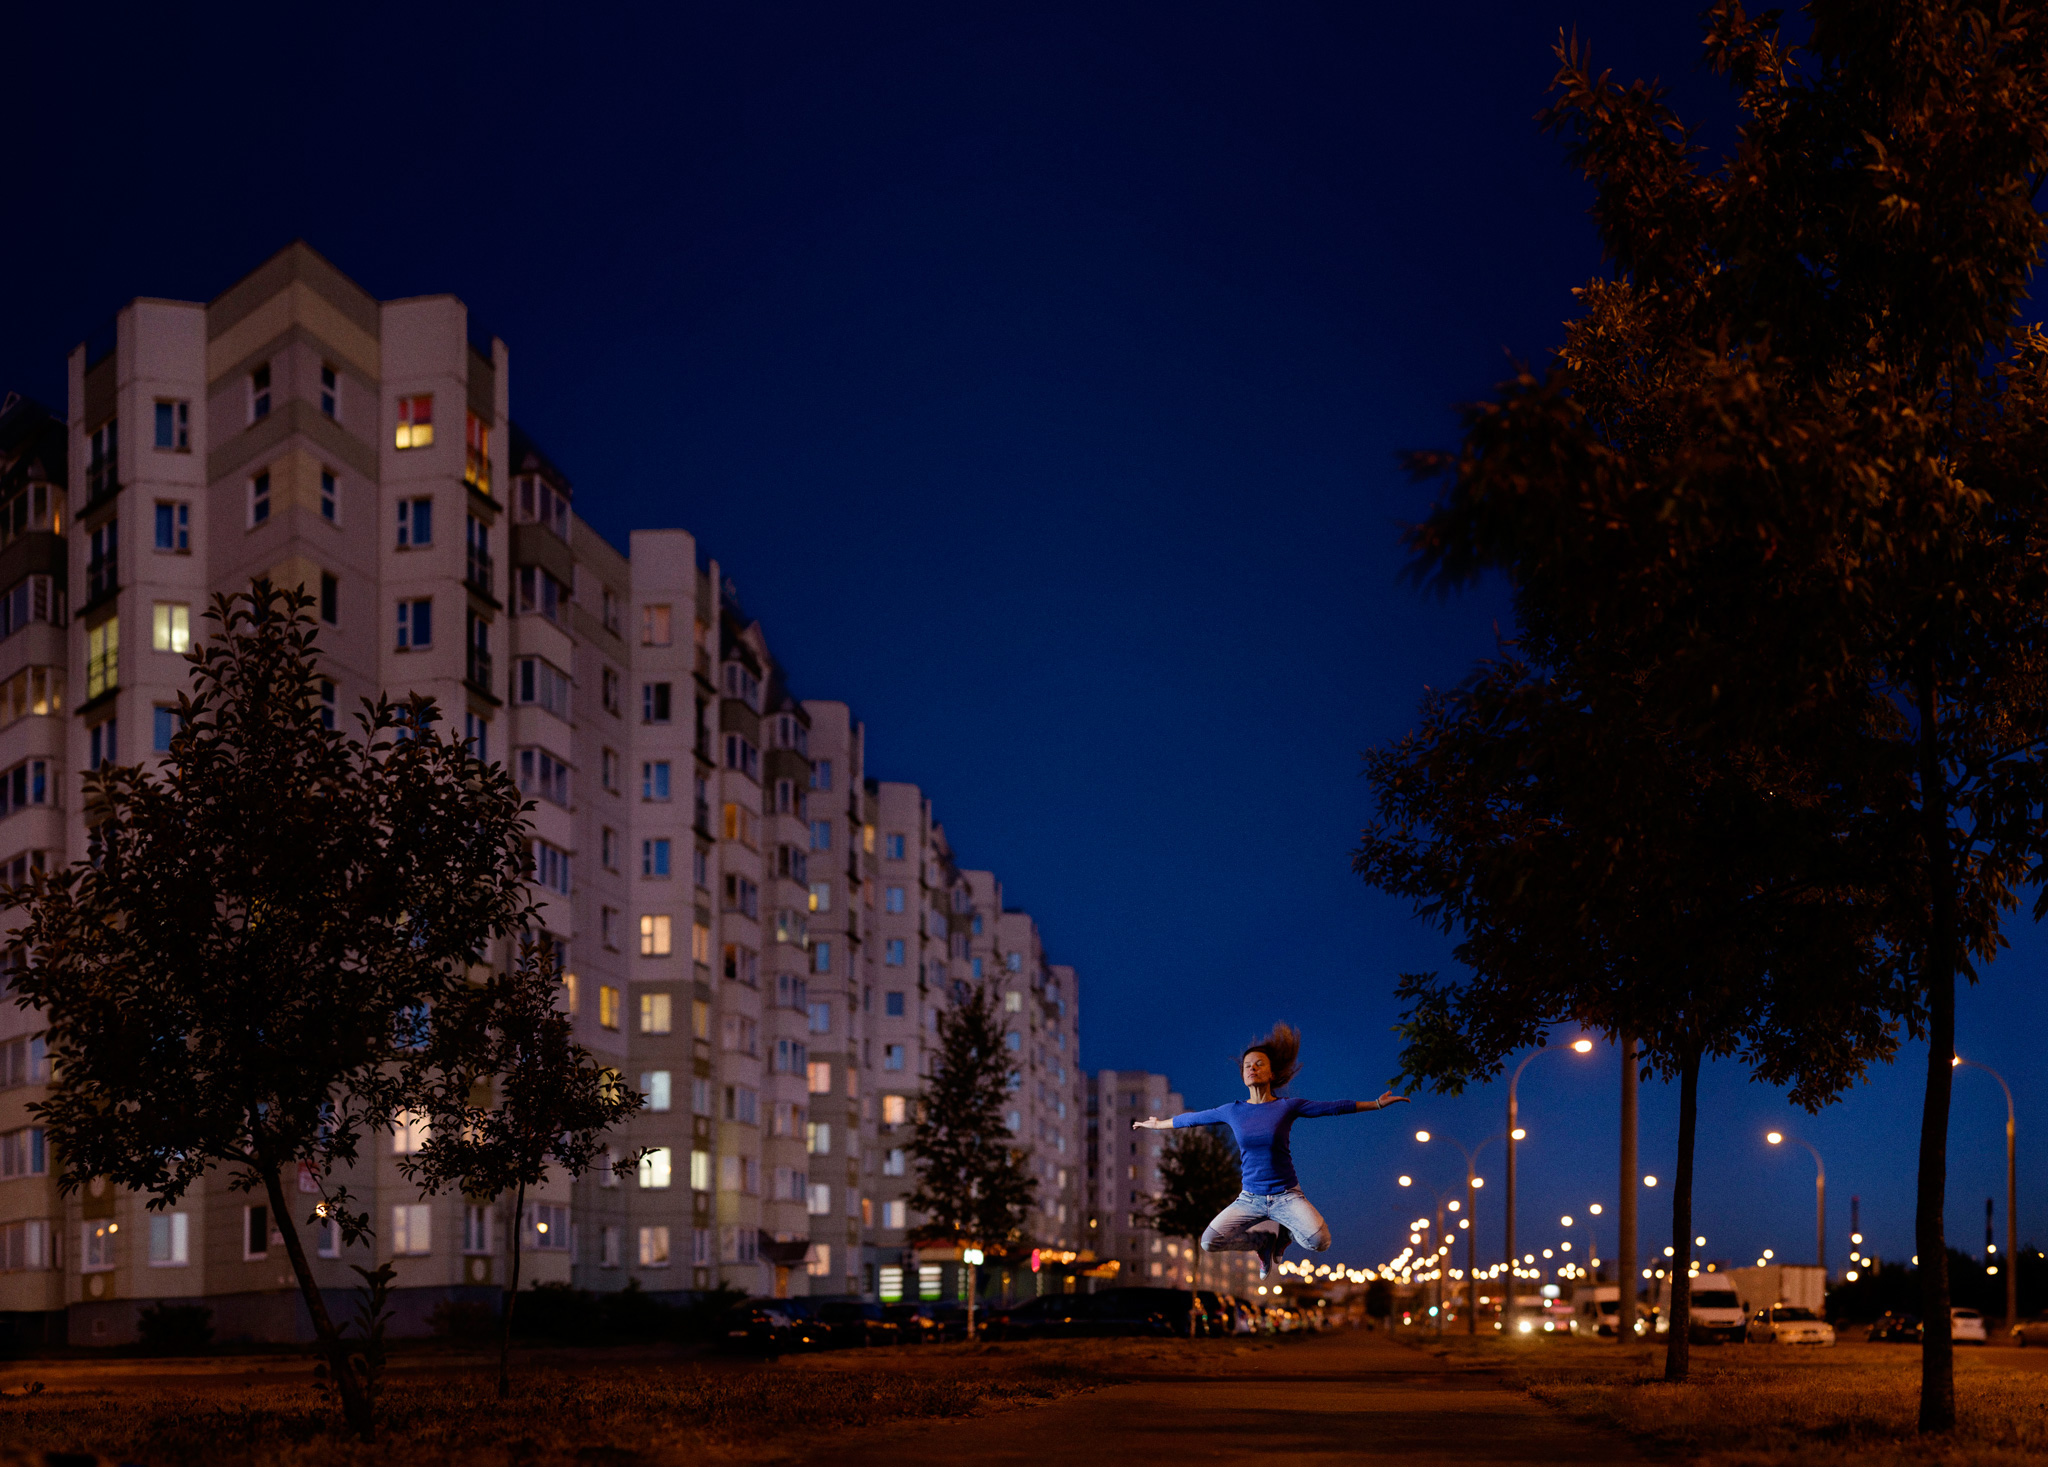 Night portrait created with Brenizer Method